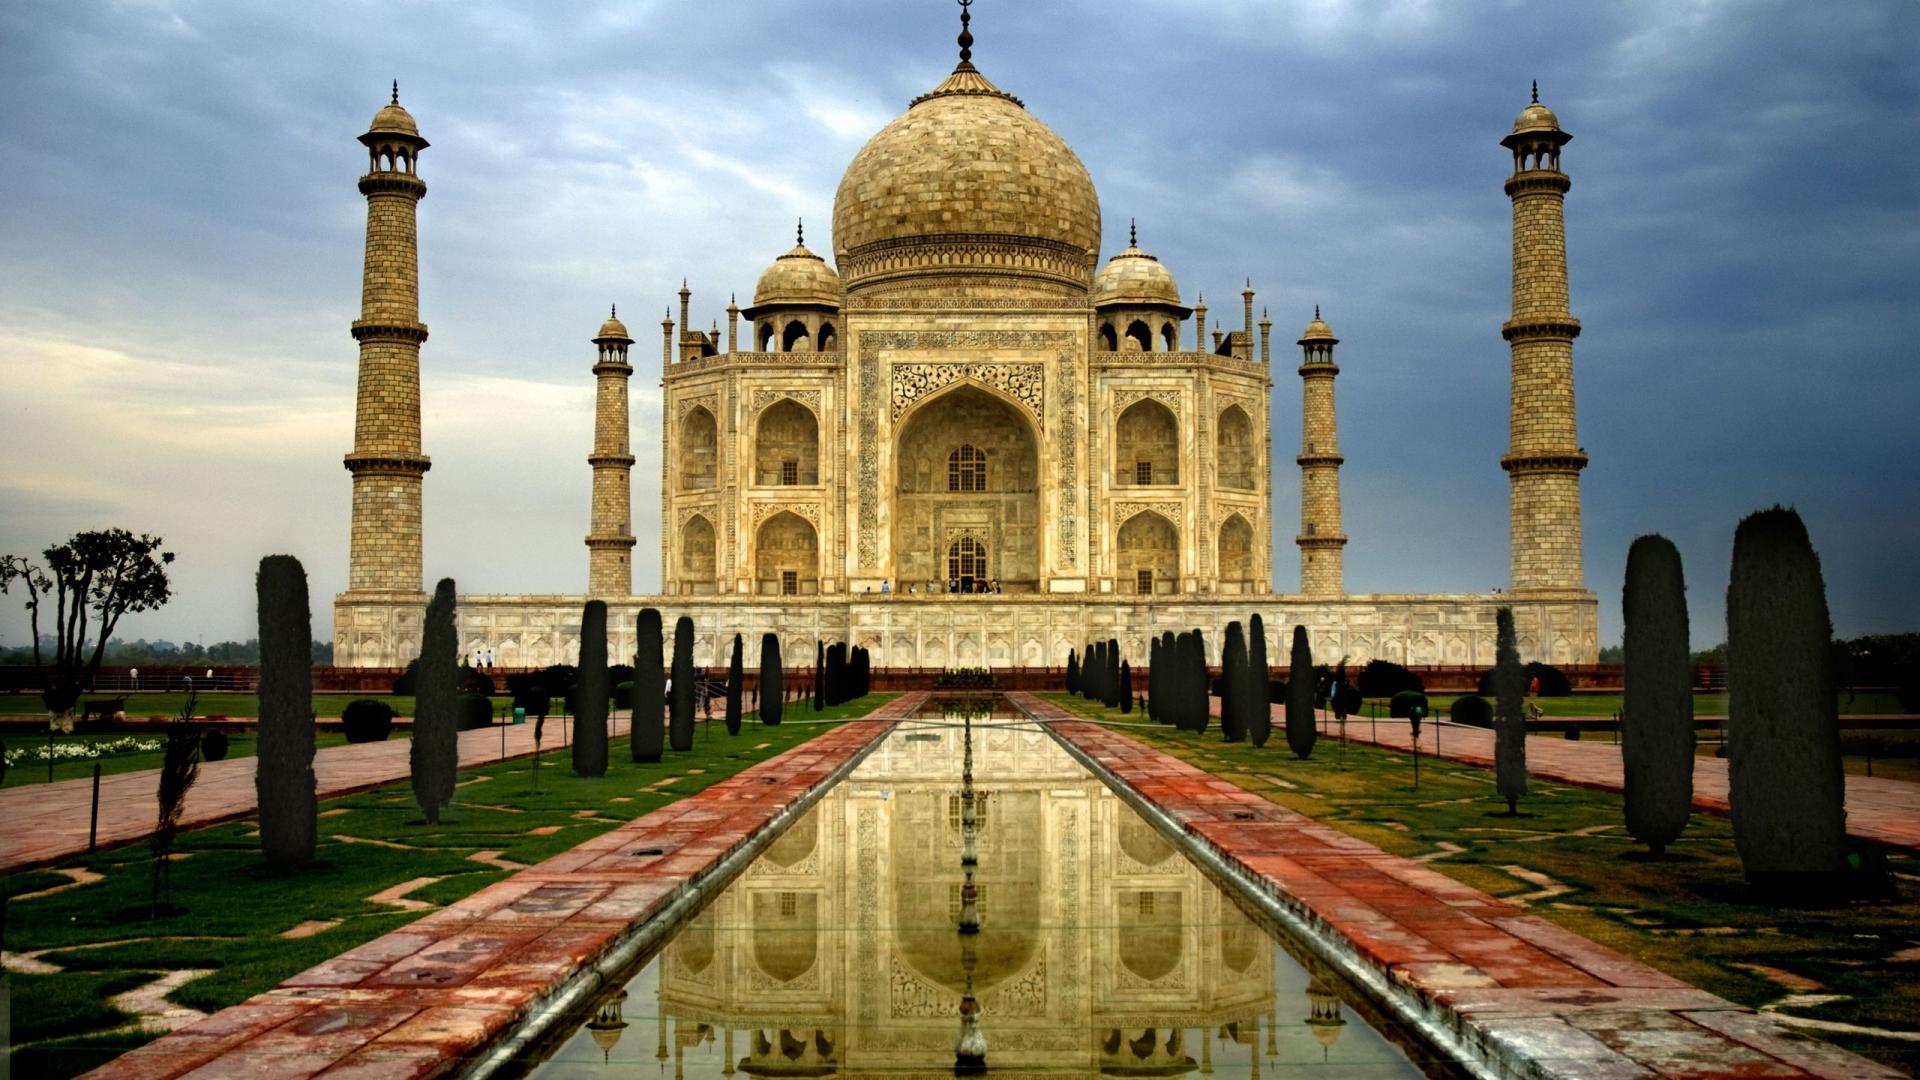 Taj Mahal India Wallpapers HD Wallpapers 1920x1080